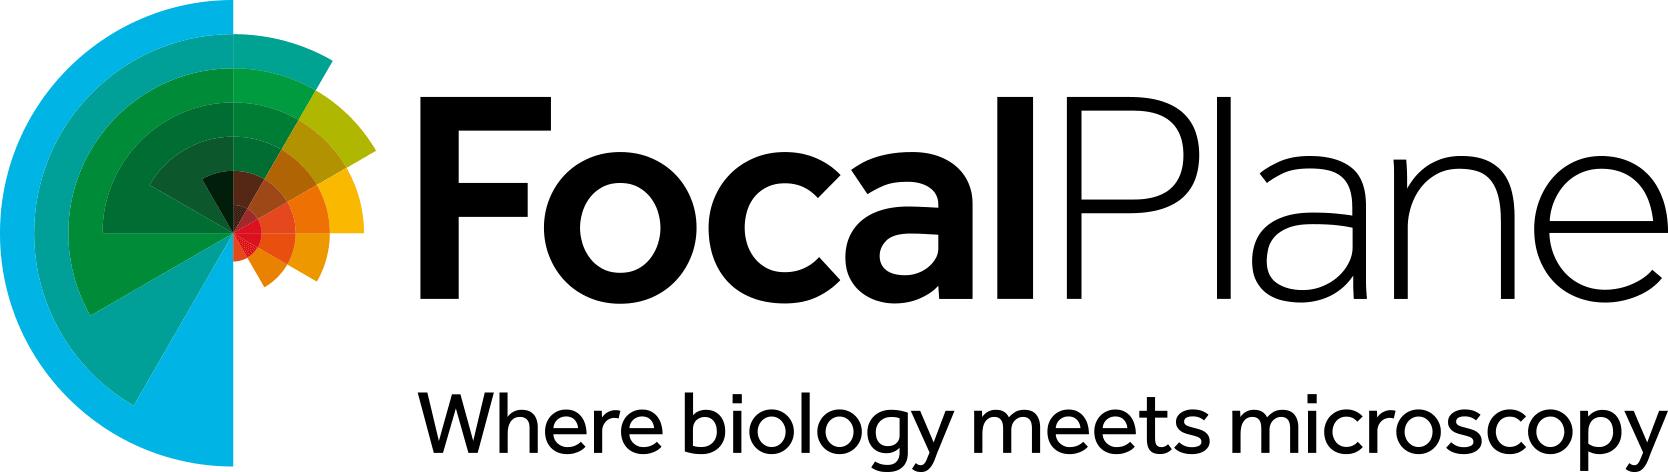 FocalPlane logo